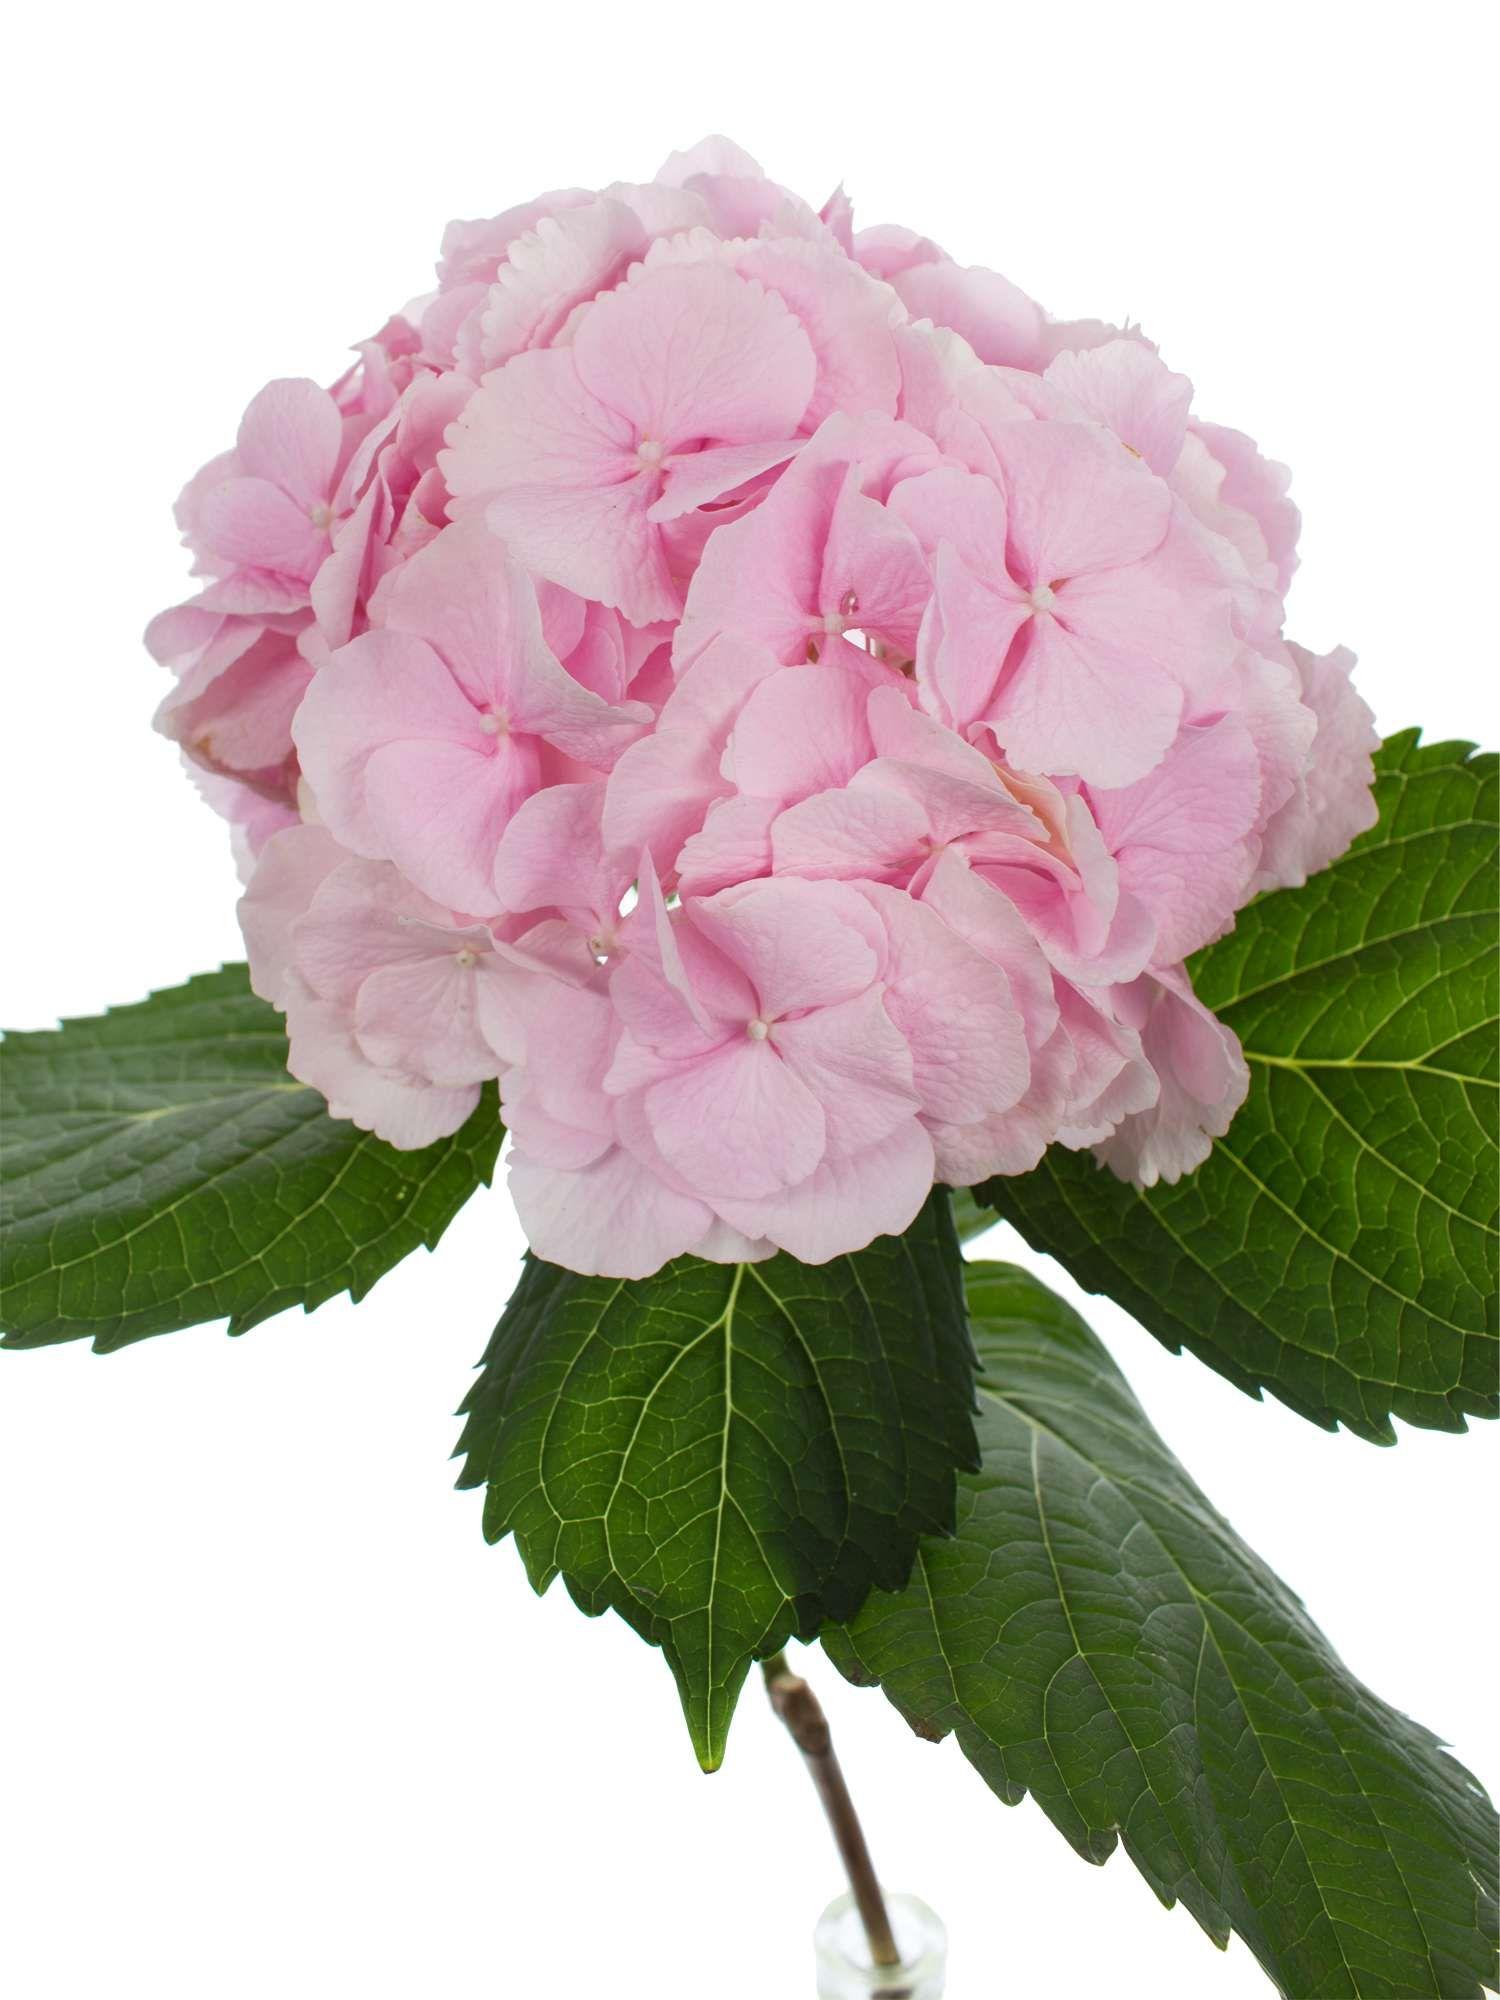 hortensie verena rosa pinterest peony. Black Bedroom Furniture Sets. Home Design Ideas